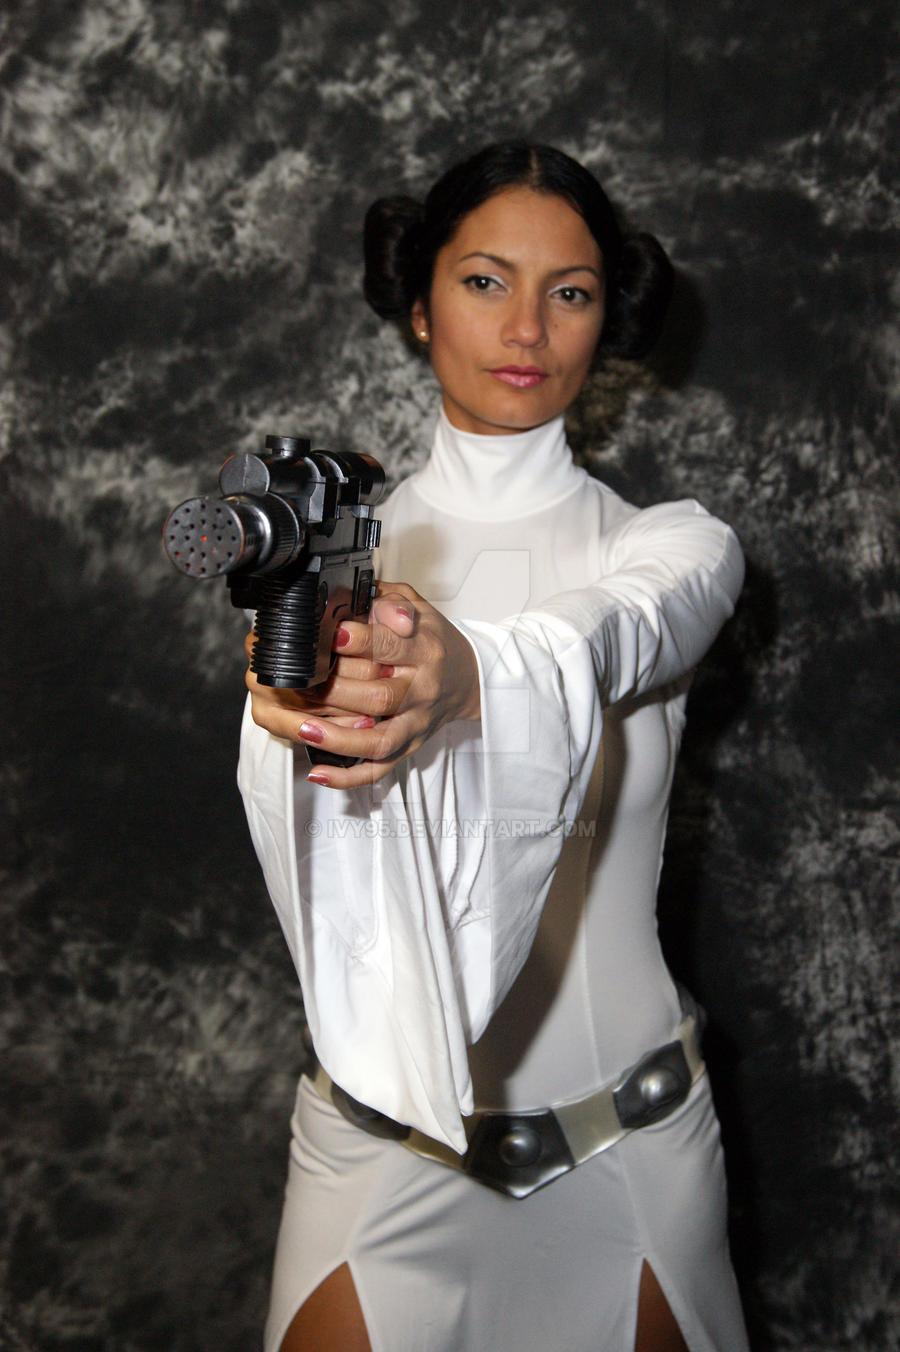 Princess Leia by Ivy95